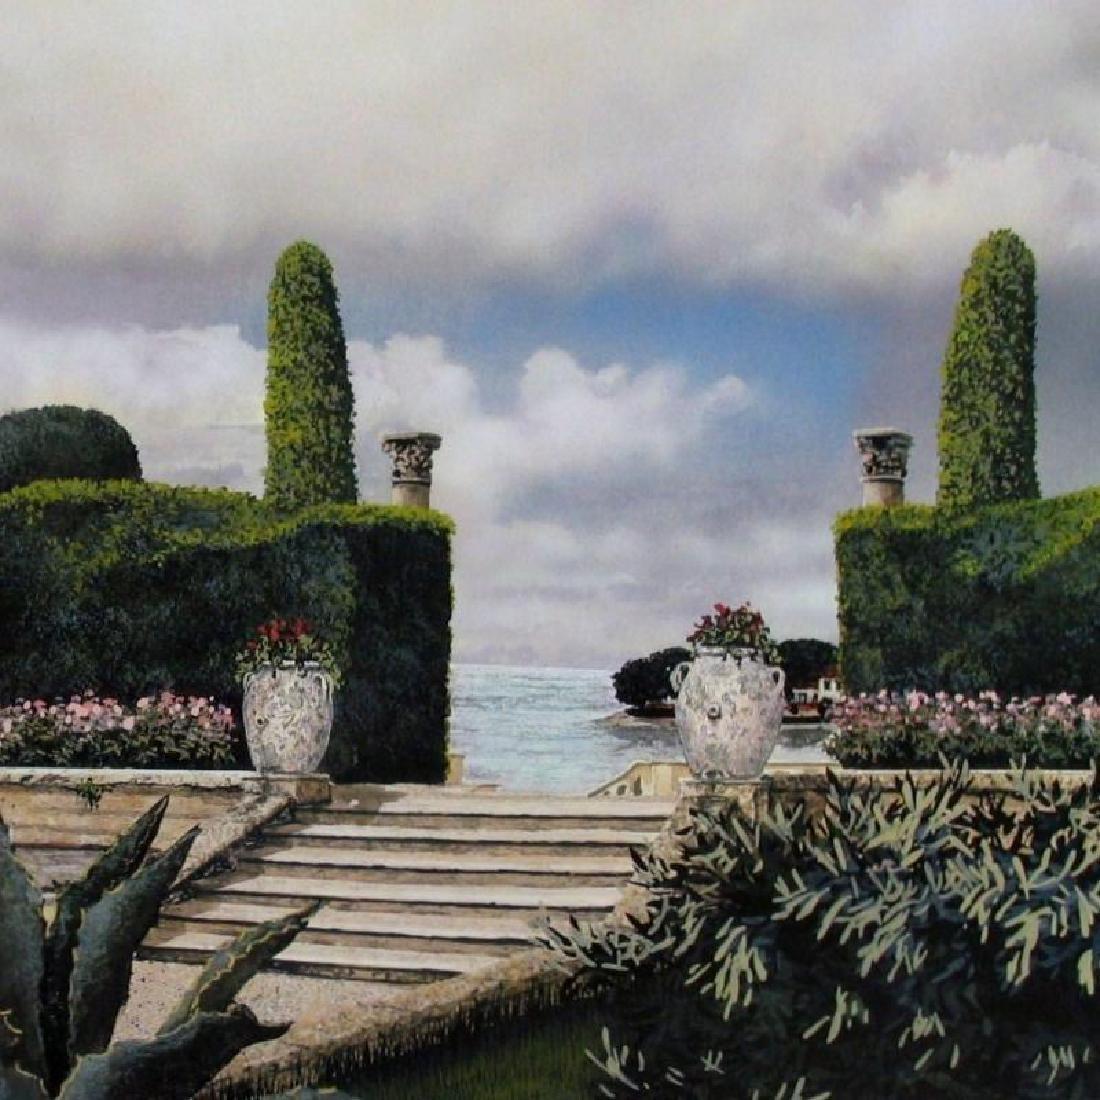 Print James Harris Stairway Landscape Realistic - 2